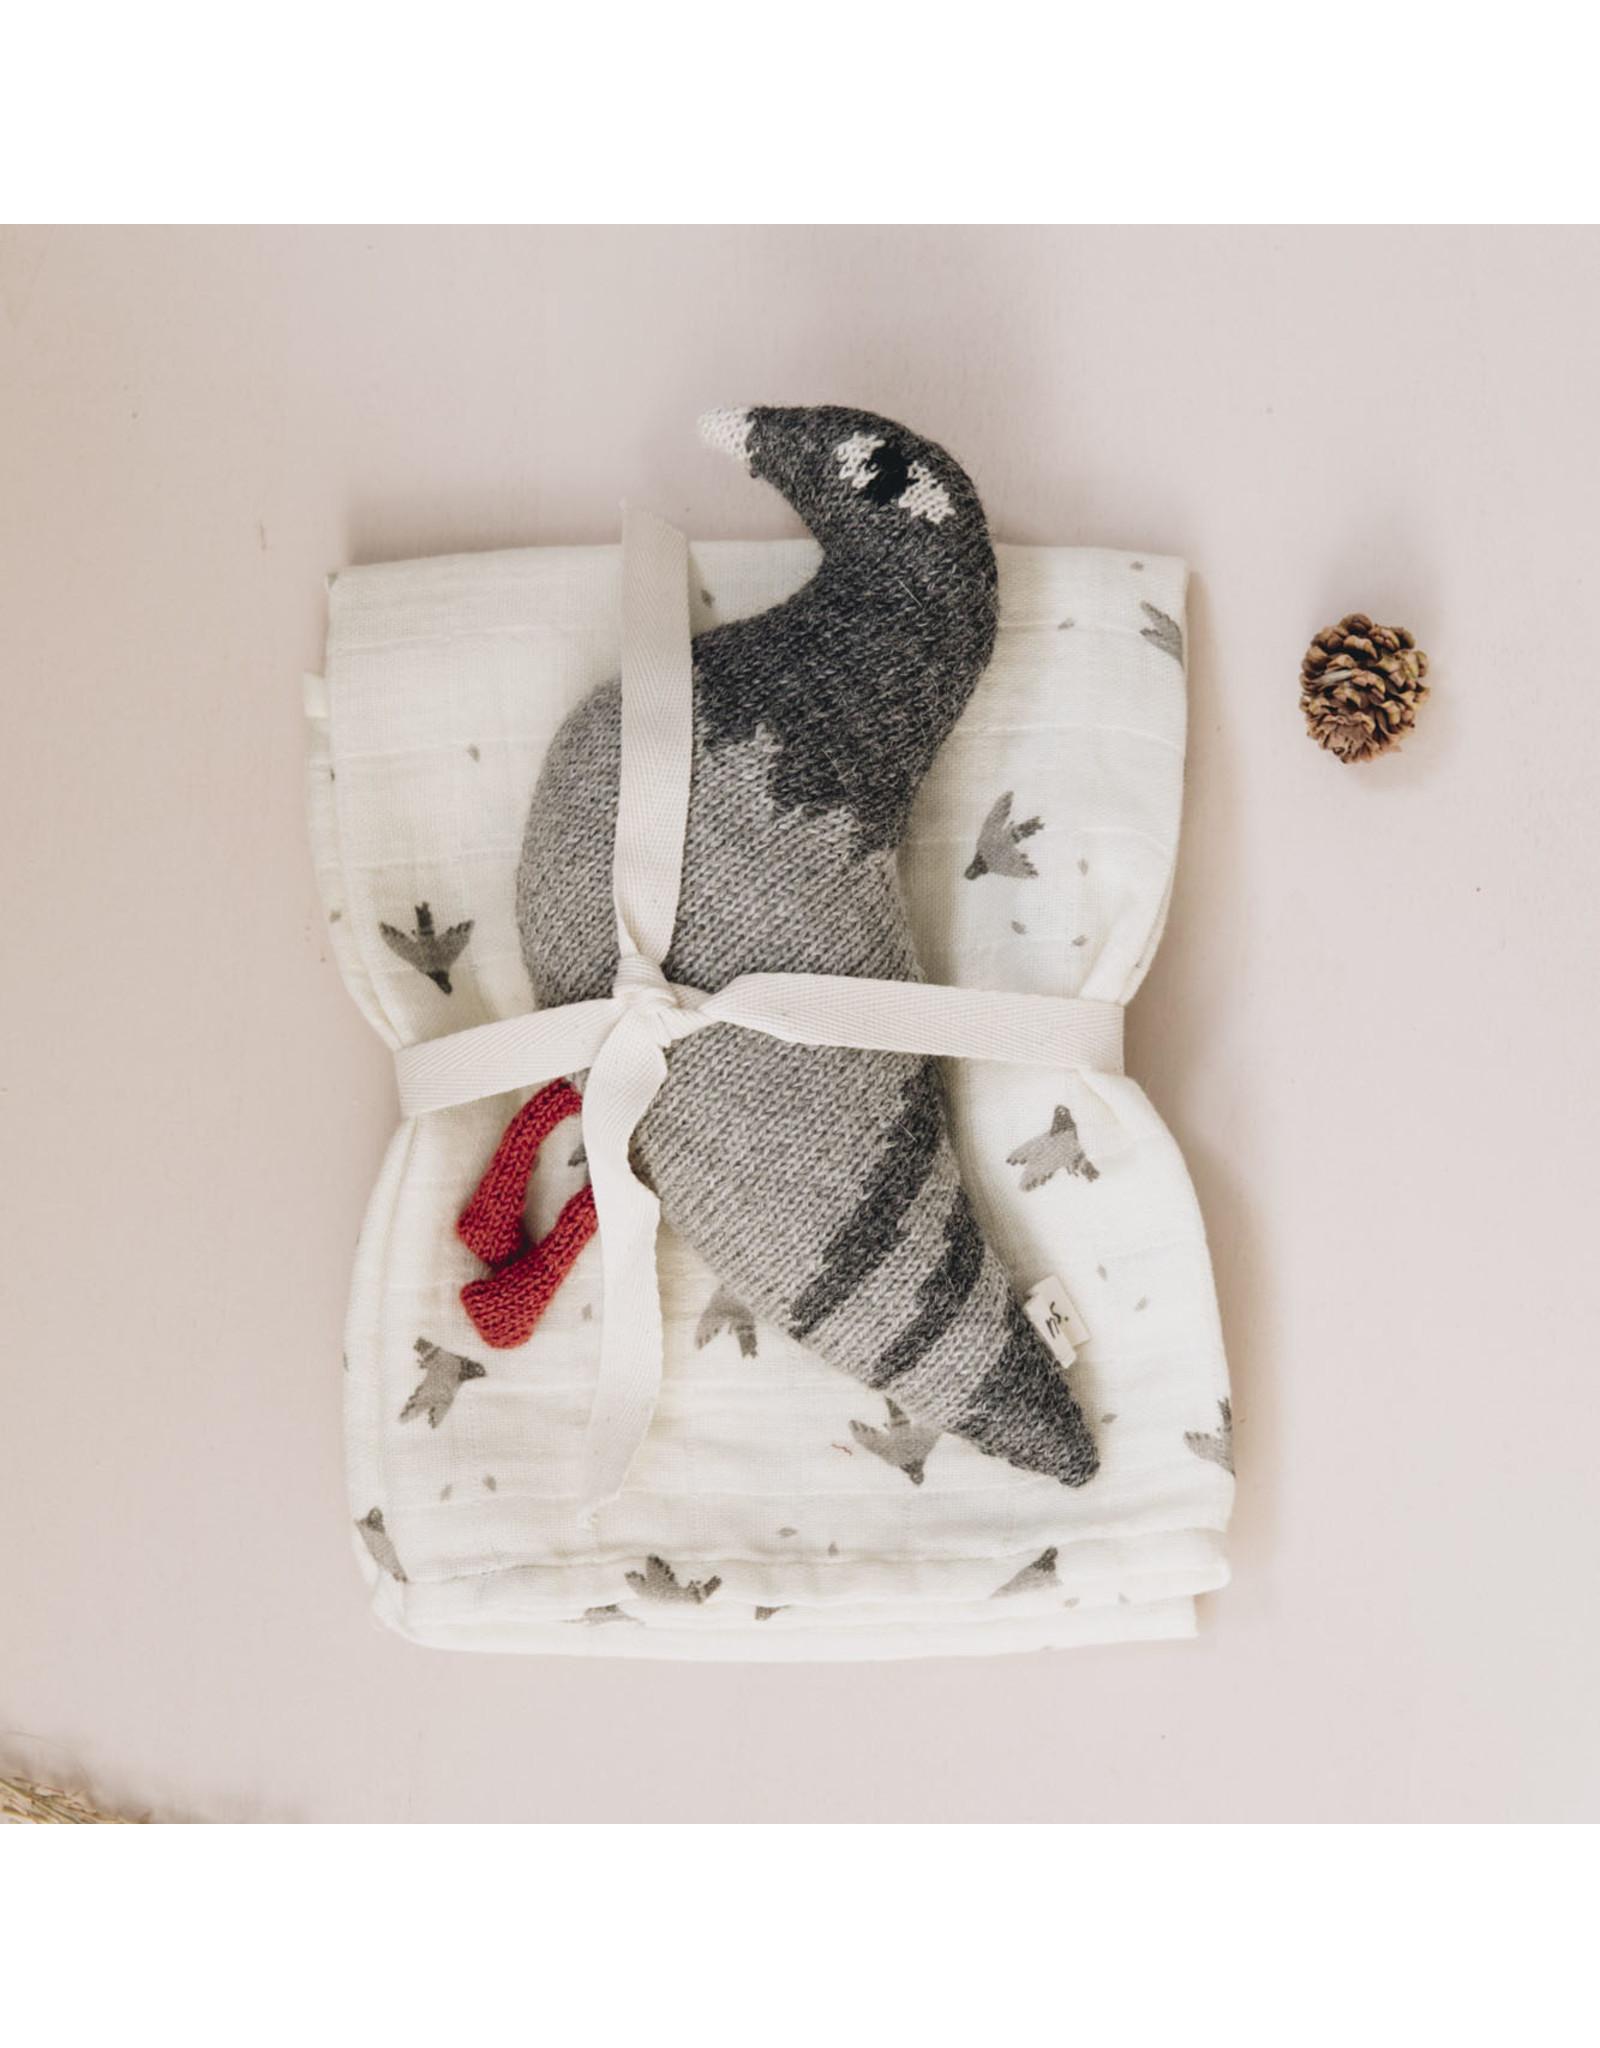 Main sauvage Main Sauvages Langes 70 x70 Pigeons Ecru